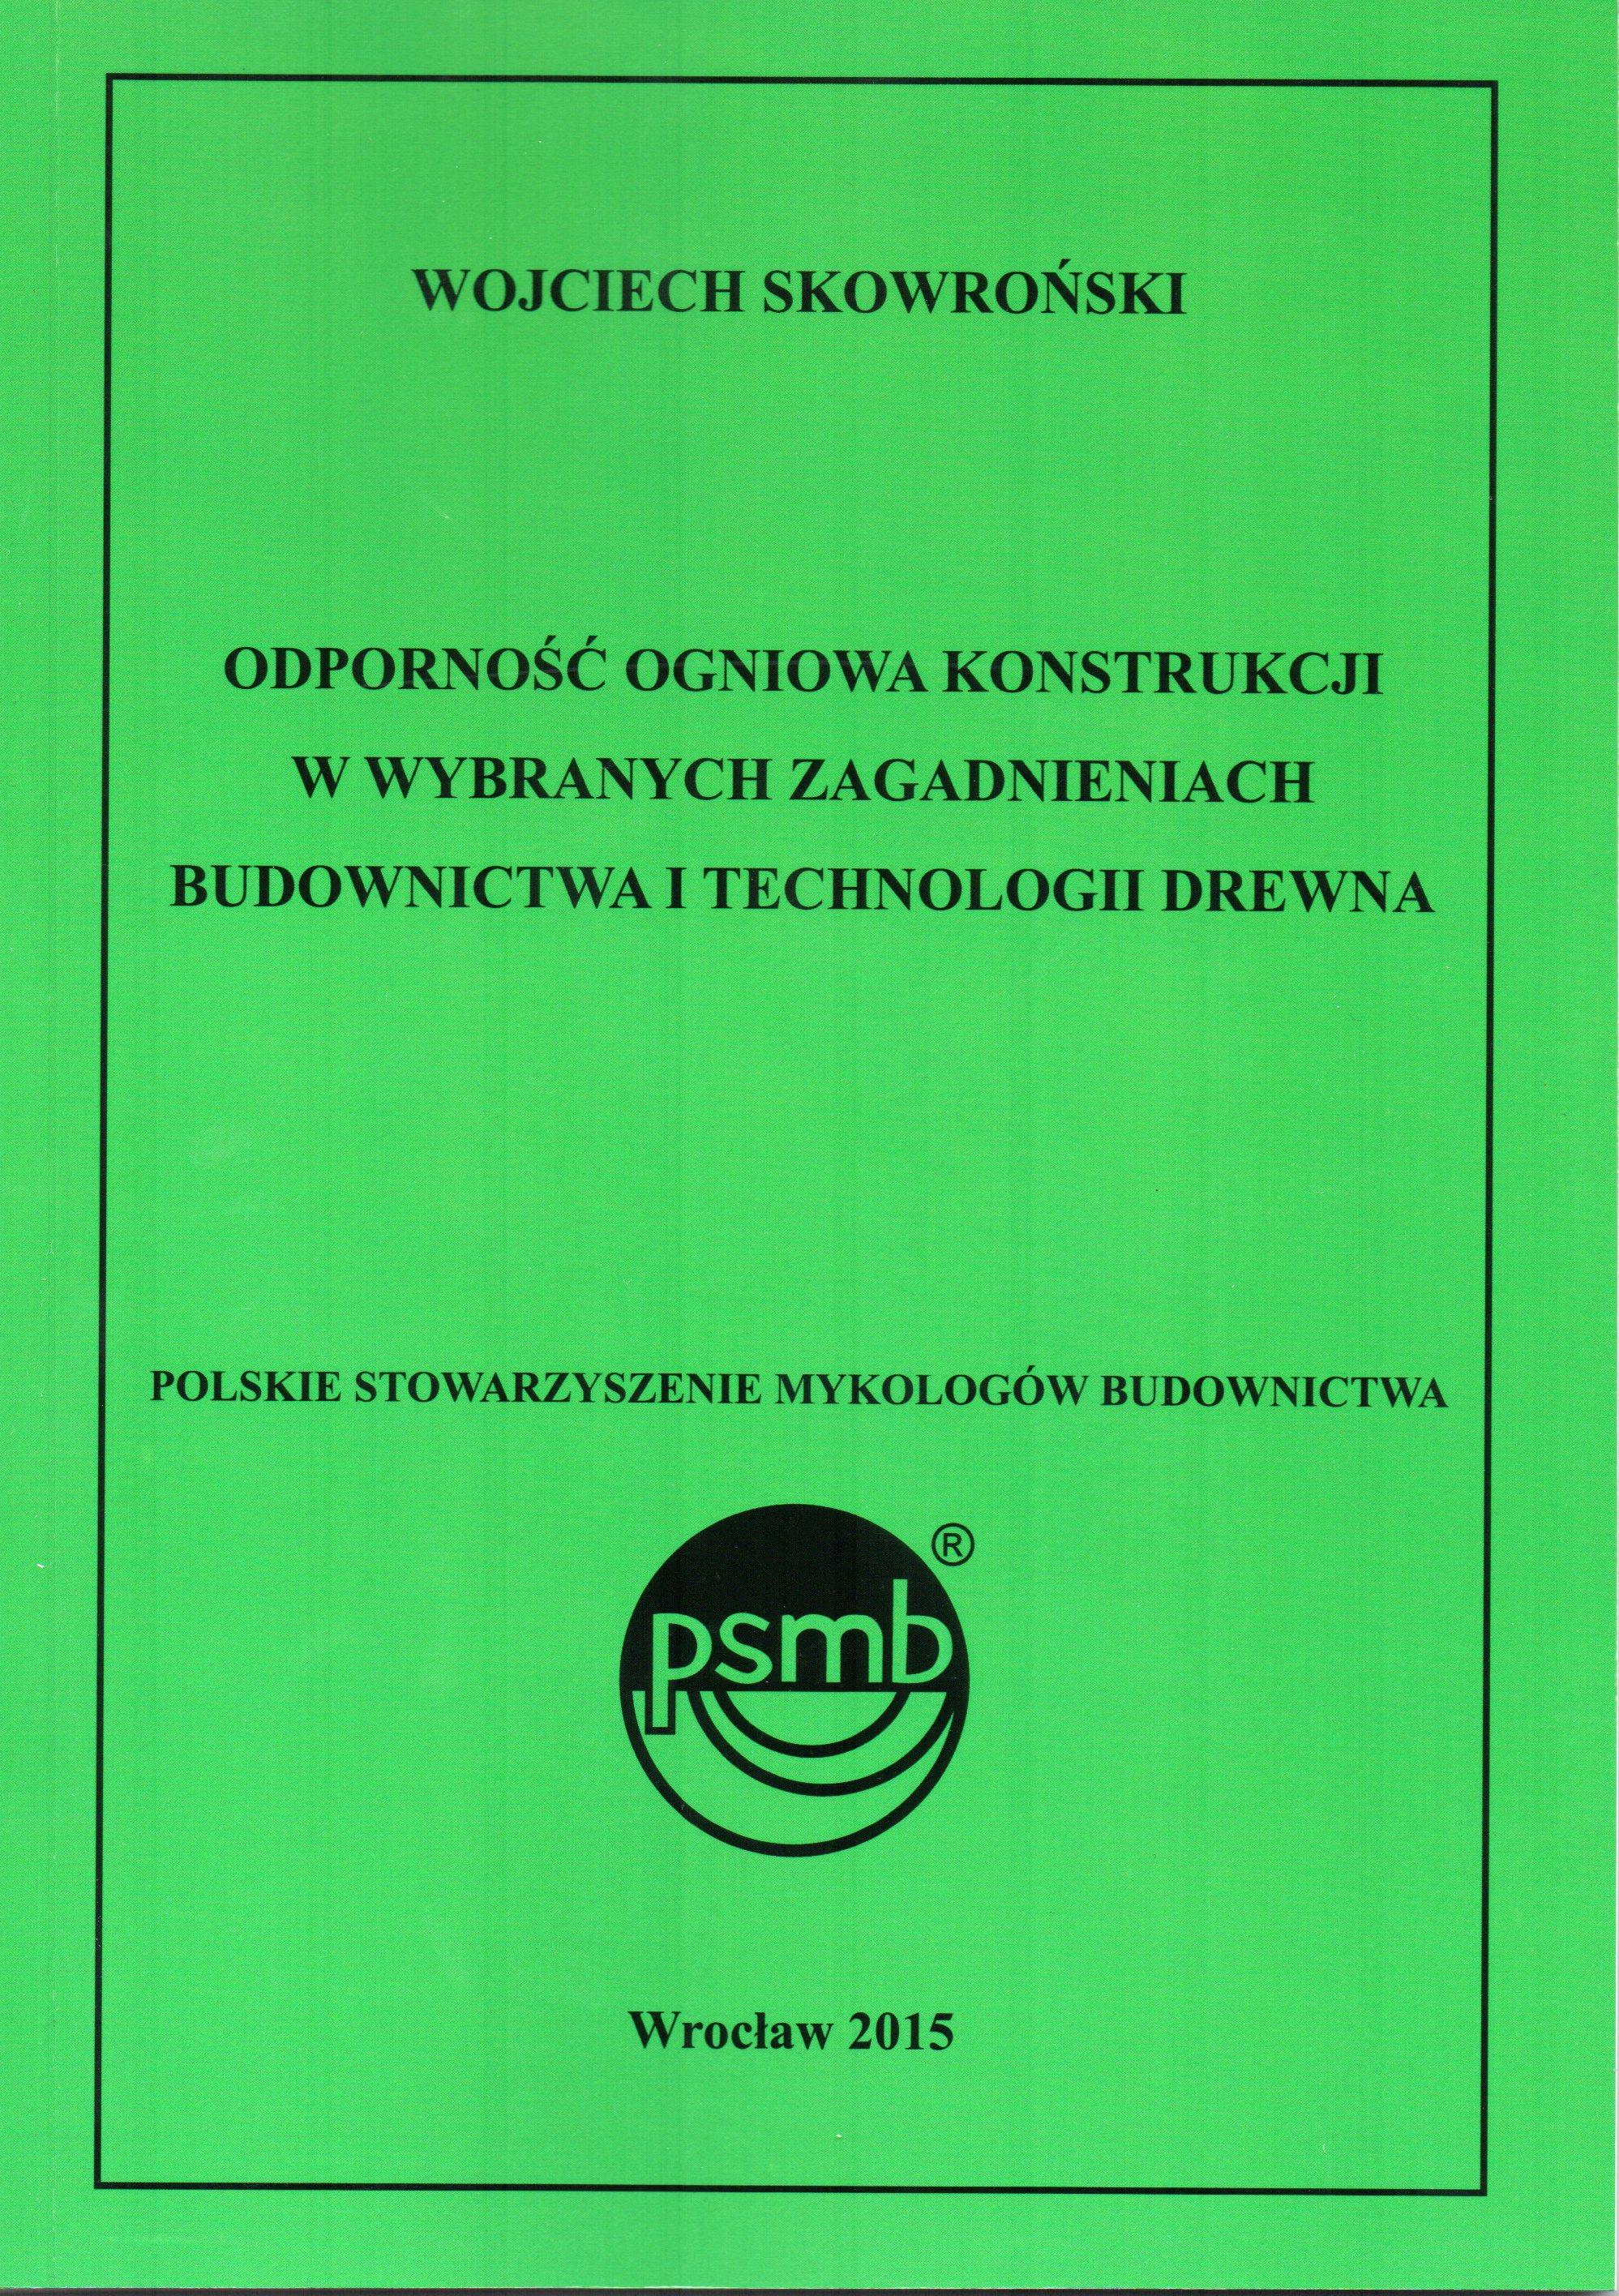 img592